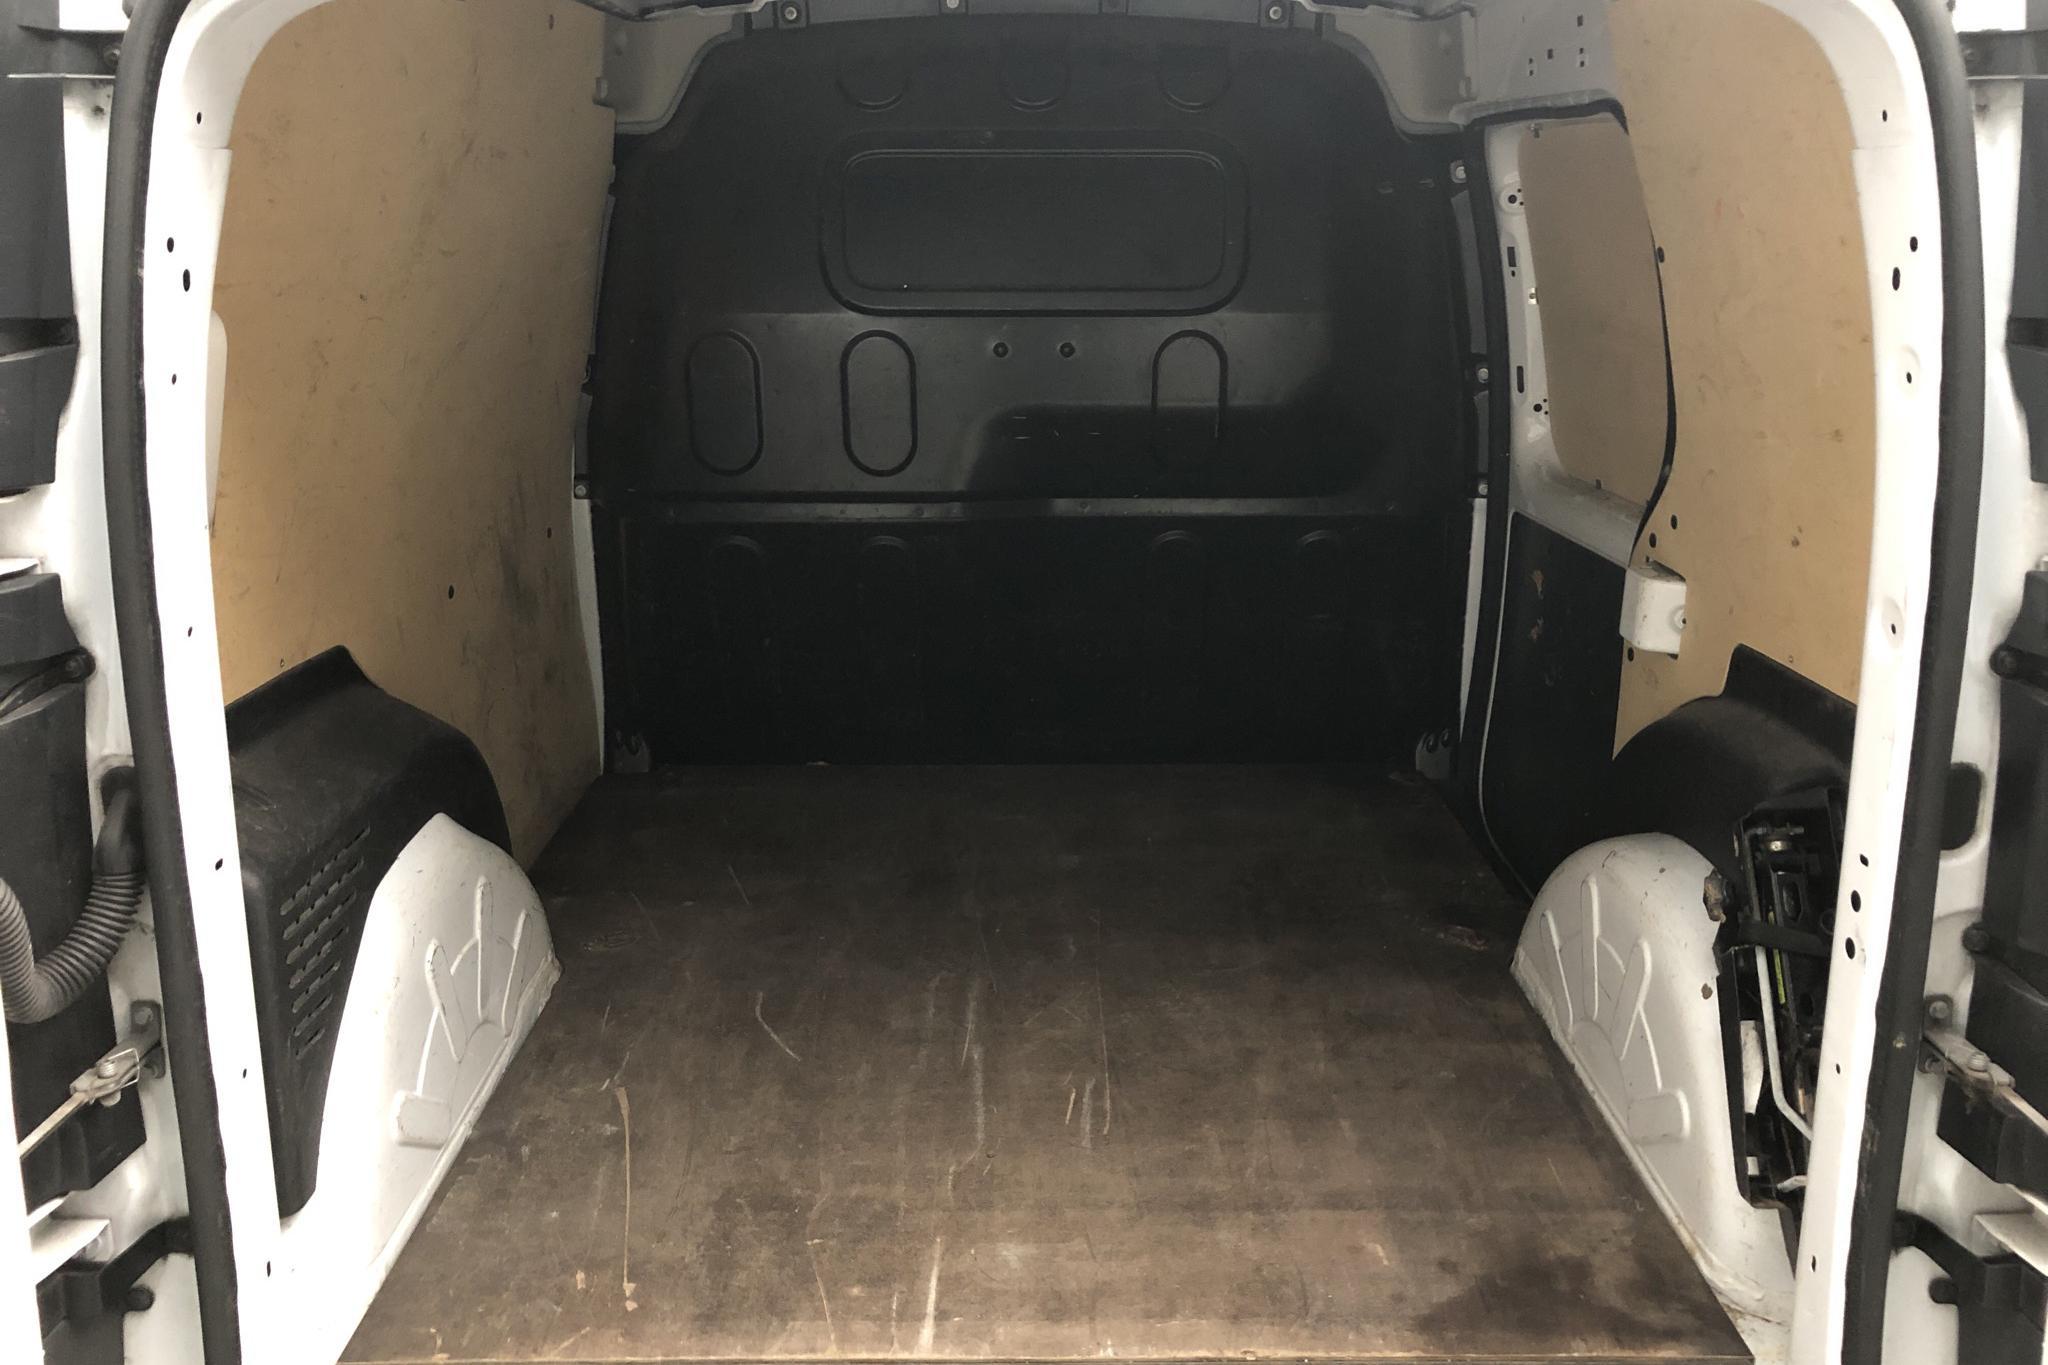 Mercedes Citan 109 1.5 CDI (90hk) - 3 848 mil - Manuell - vit - 2016